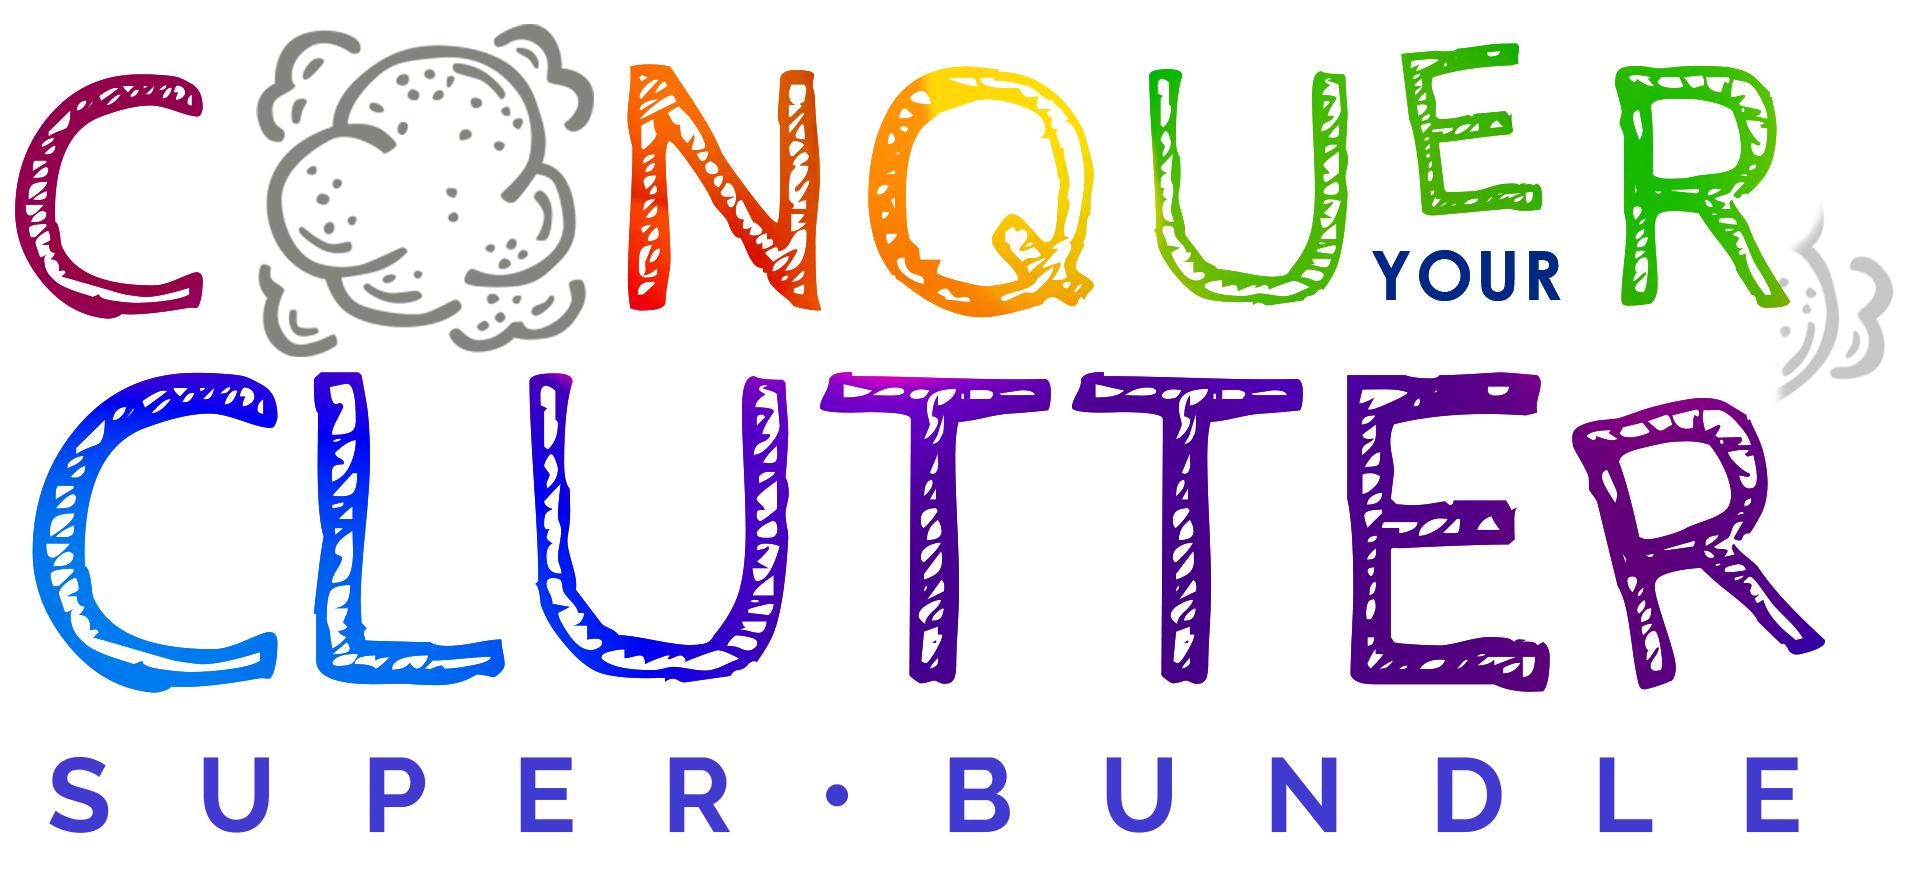 Regain Control with the Conquer Your Clutter Super Bundle